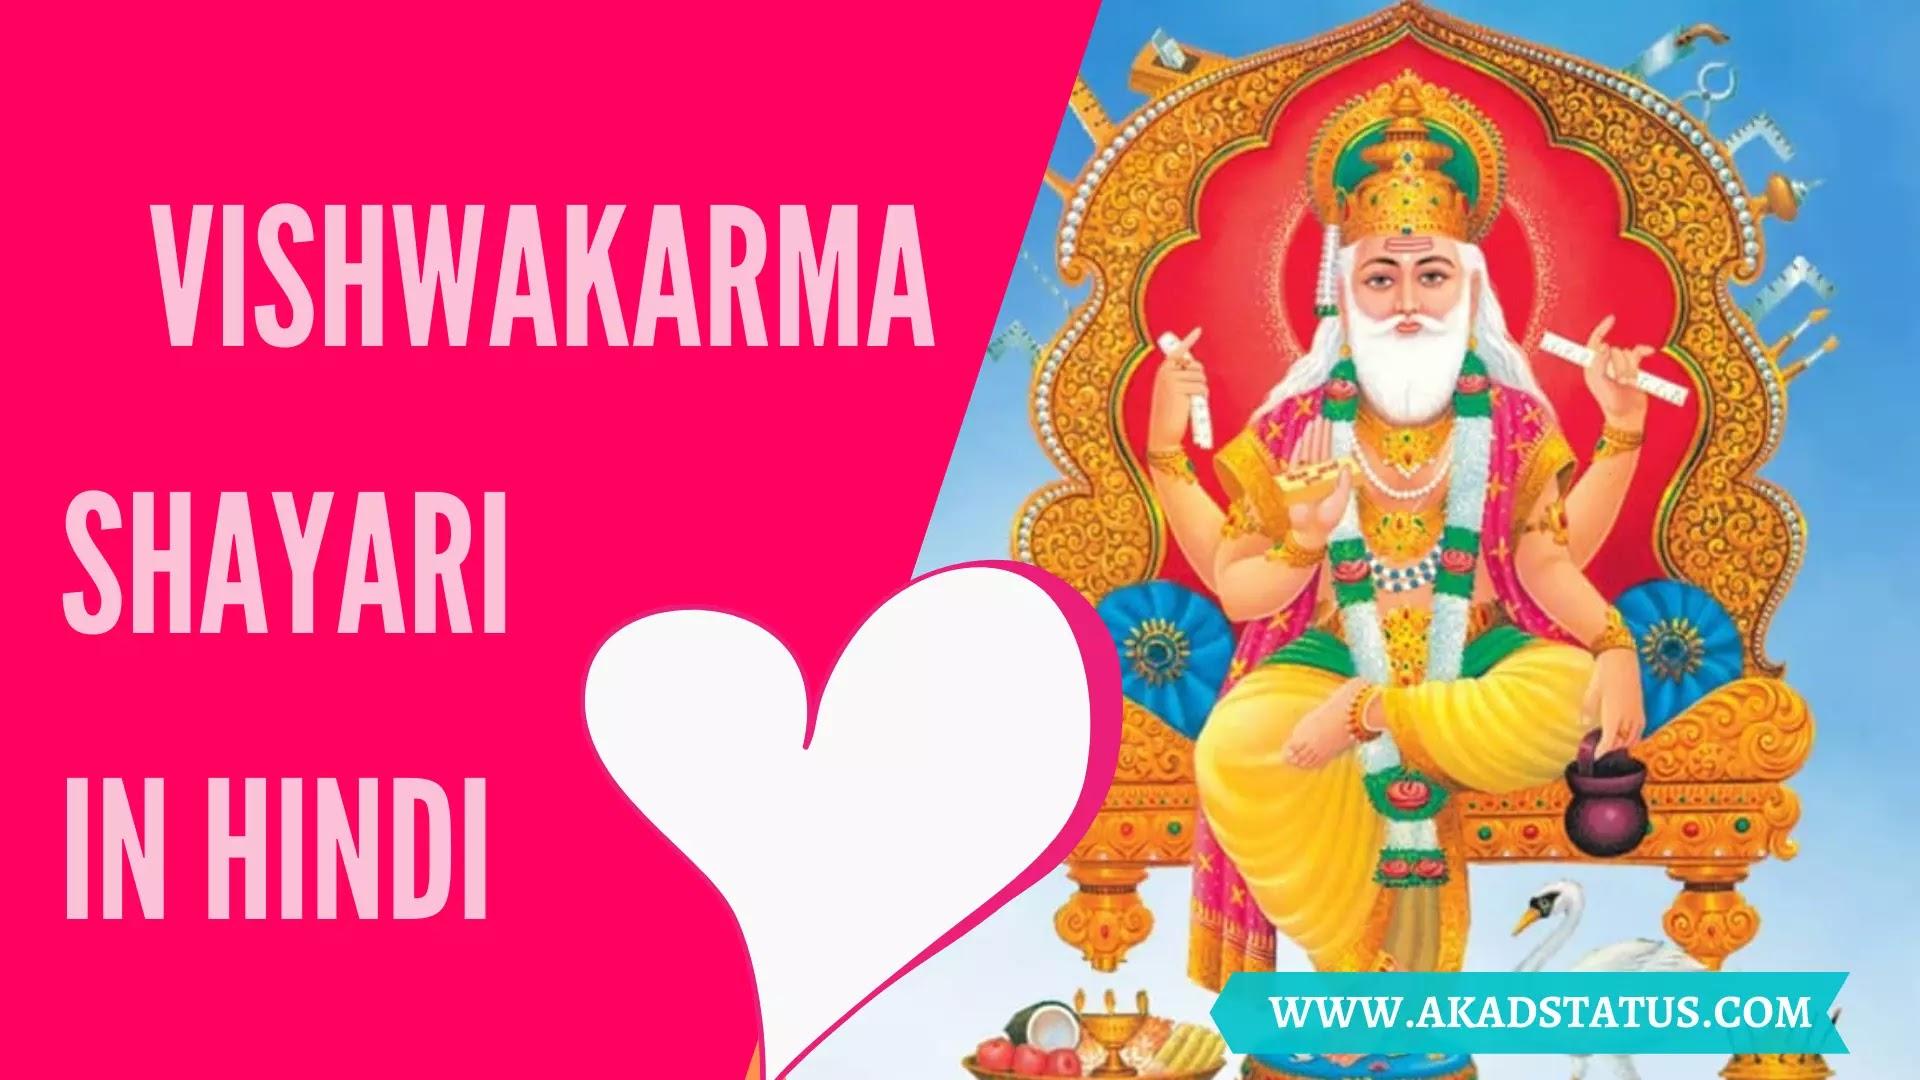 Vishwakarma Wishes in Hindi, Lohar Attitude Status in Hindi, Vishwakarma shayari, Vishwakarma Puja shayari Hindi, Vishwakarma Jayanti SMS in Hindi, Vishwakarma shayari photo